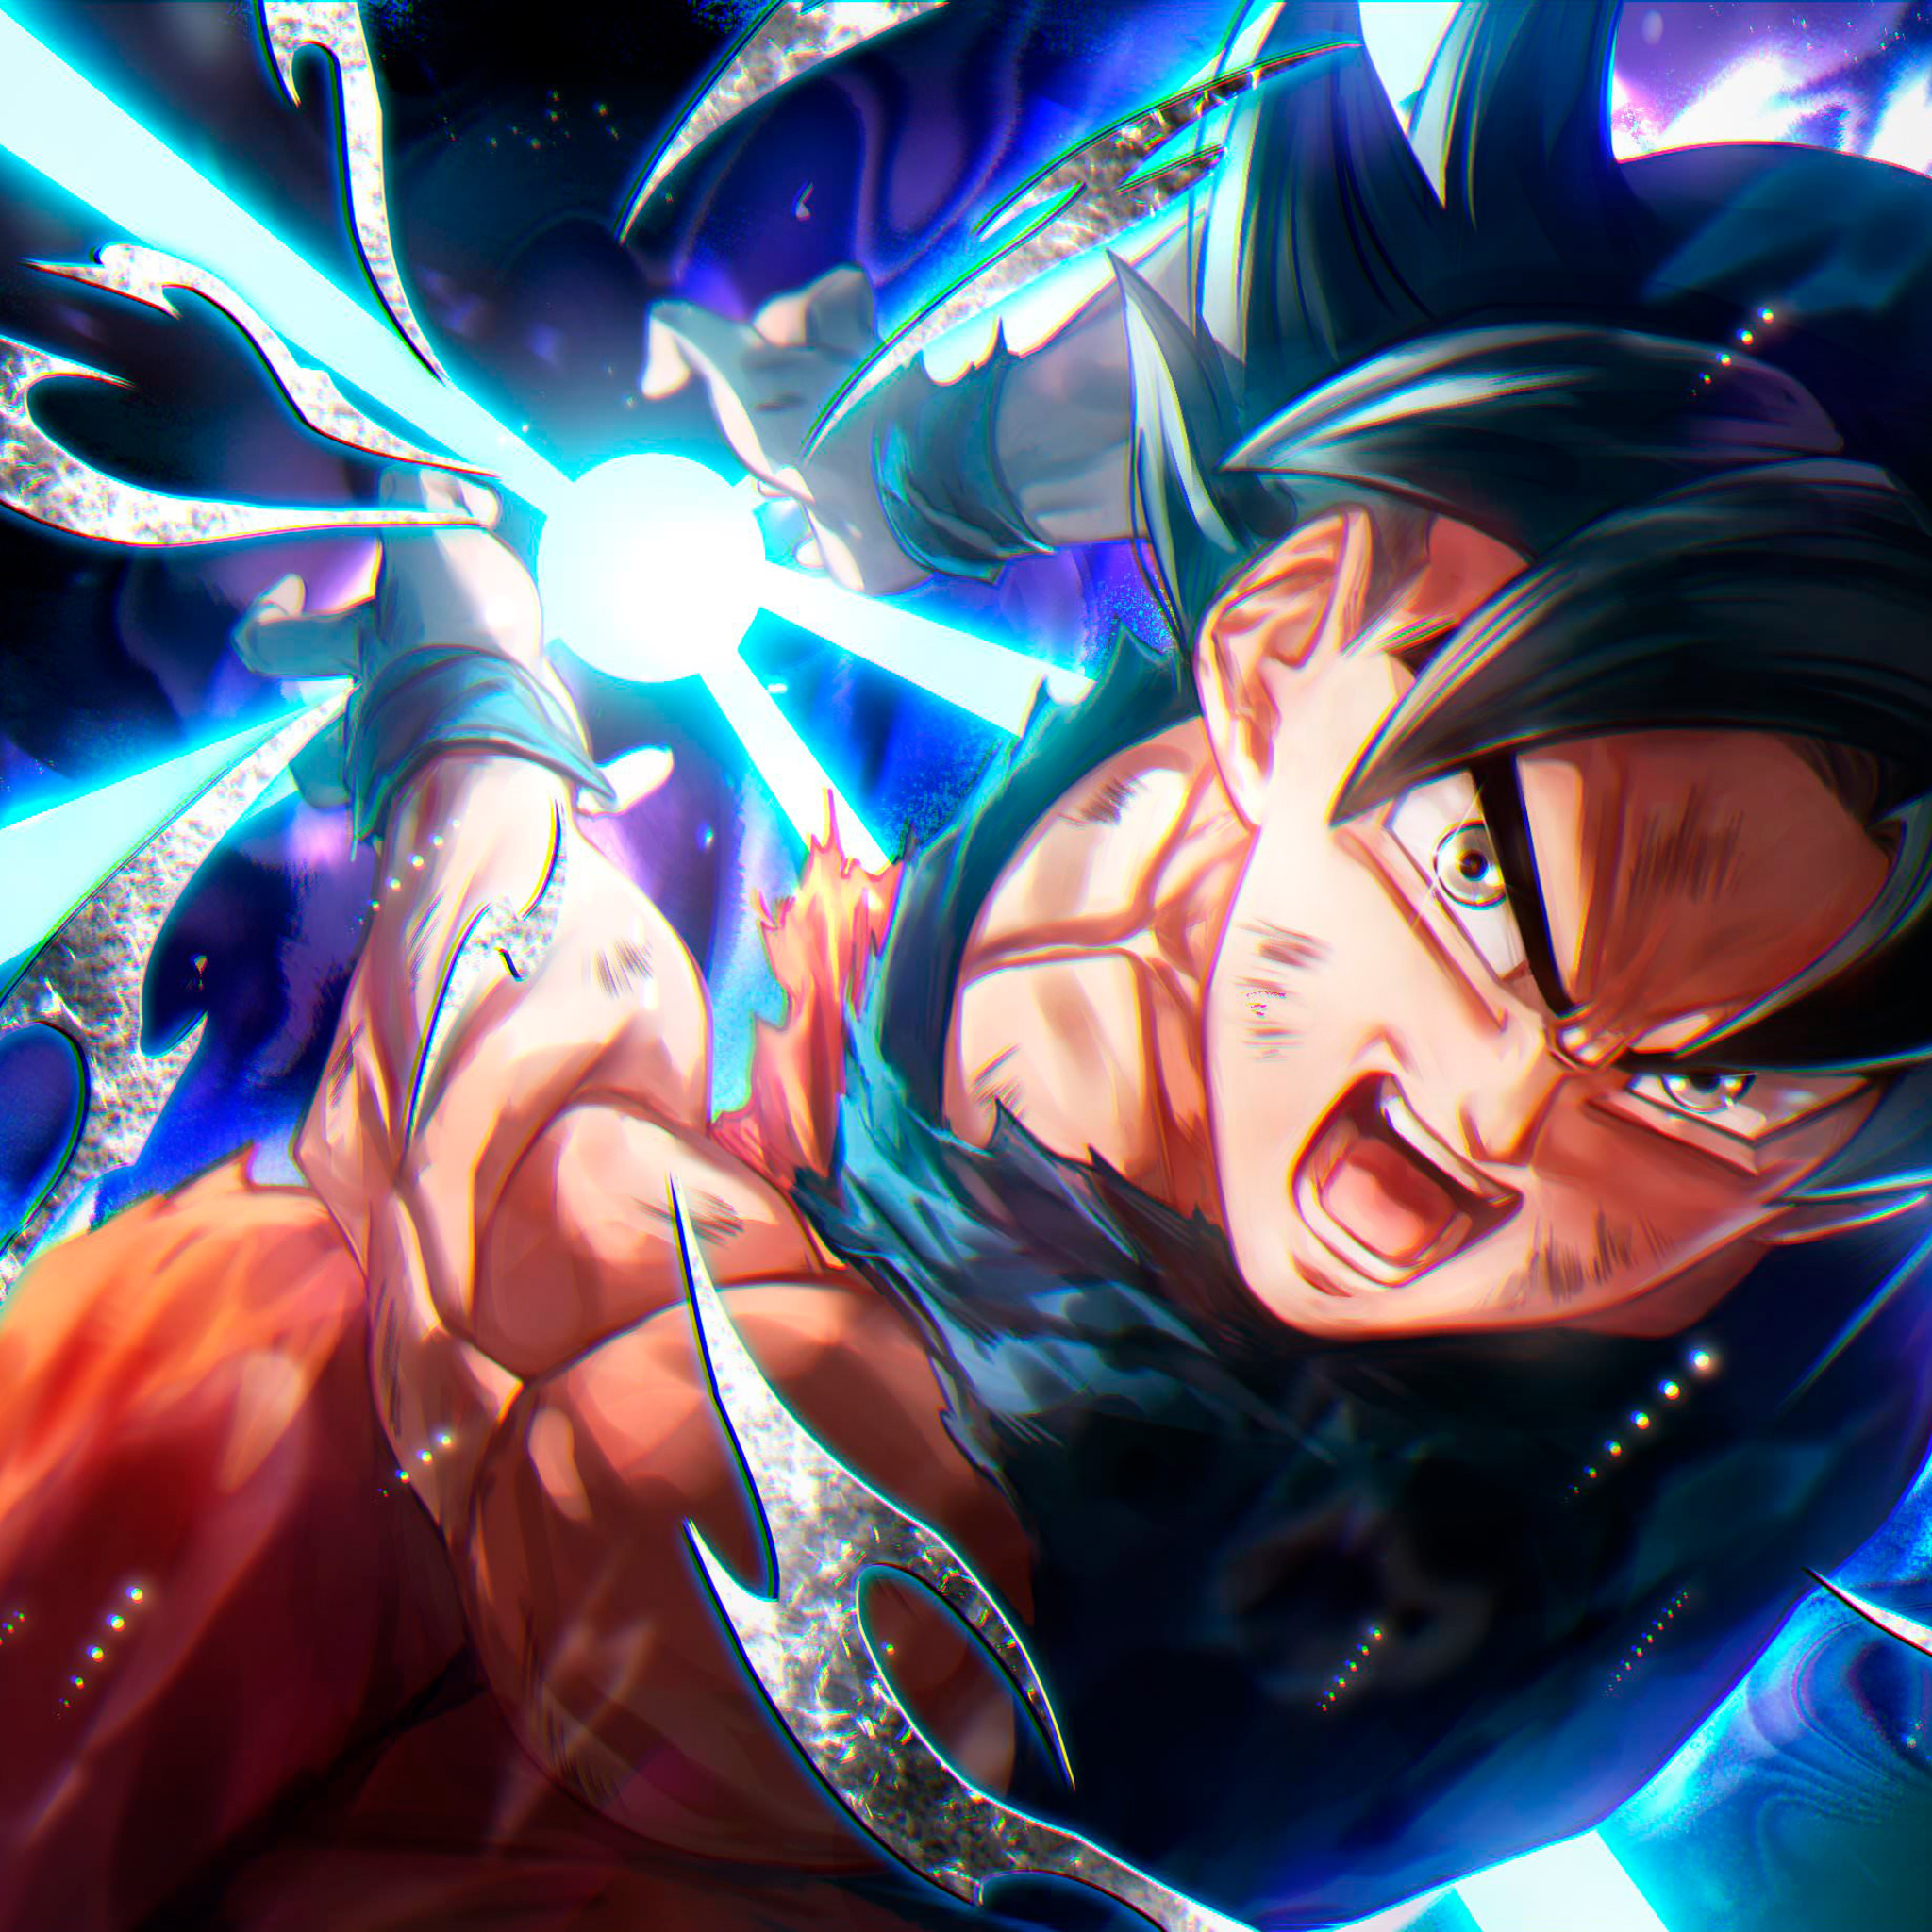 Download 500 Wallpaper Anime 4k Download HD Gratis